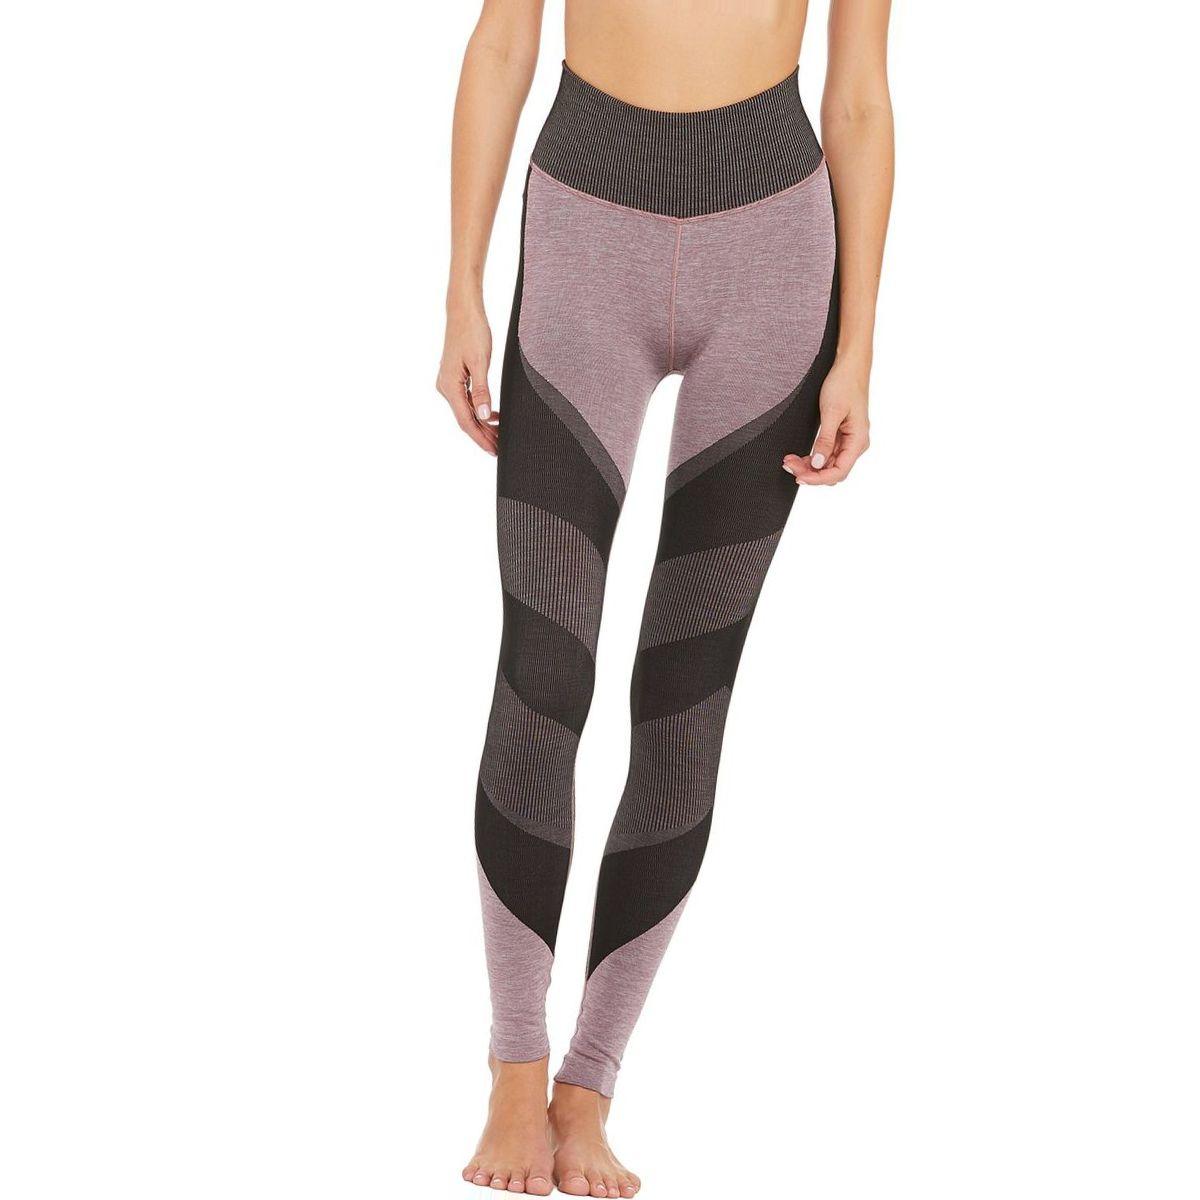 Alo Yoga High-Waist Seamless Lift Legging - Women's